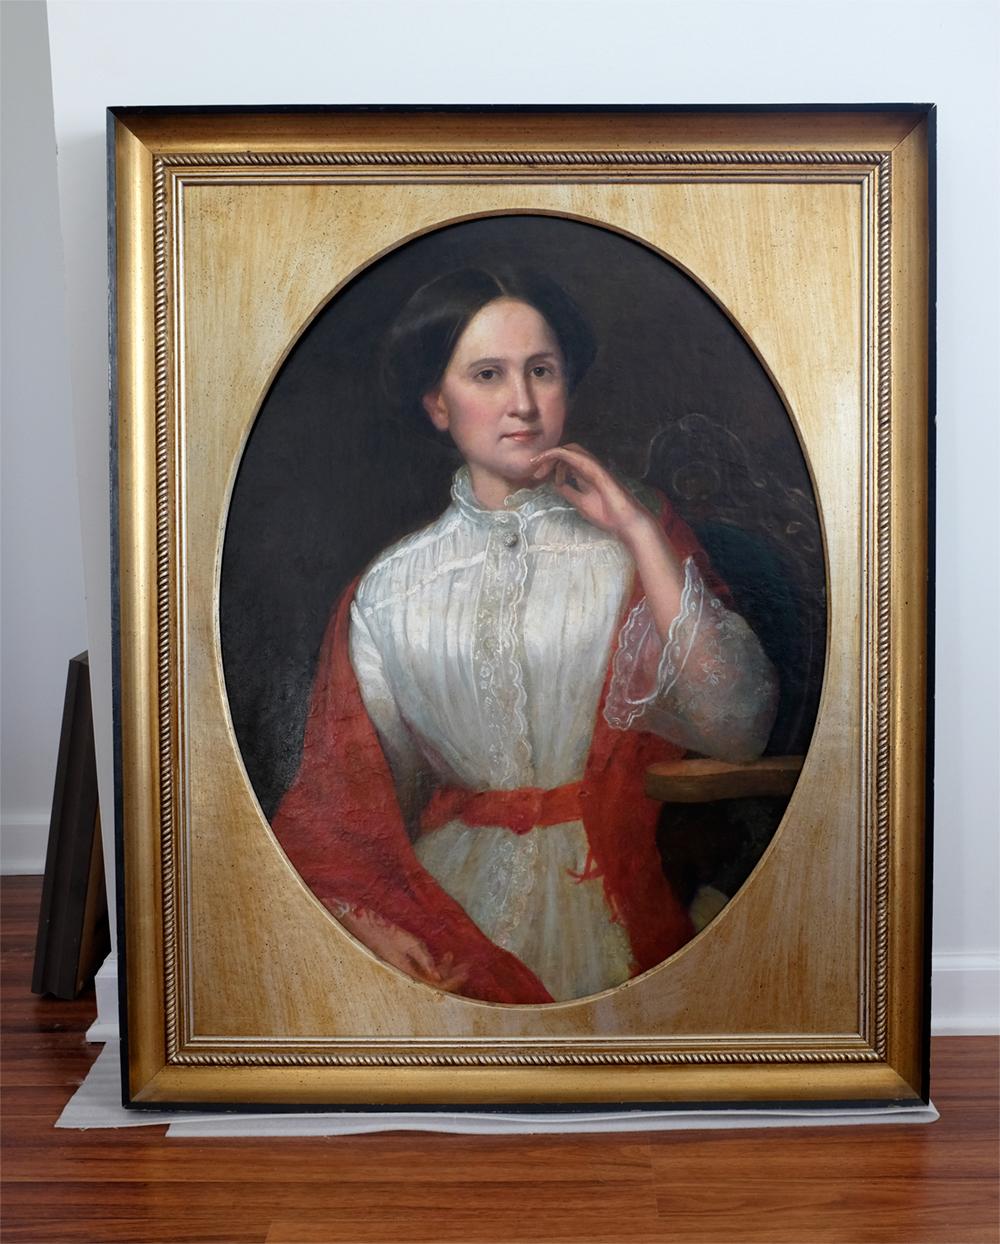 Elegant portrait painting fully restored and framed